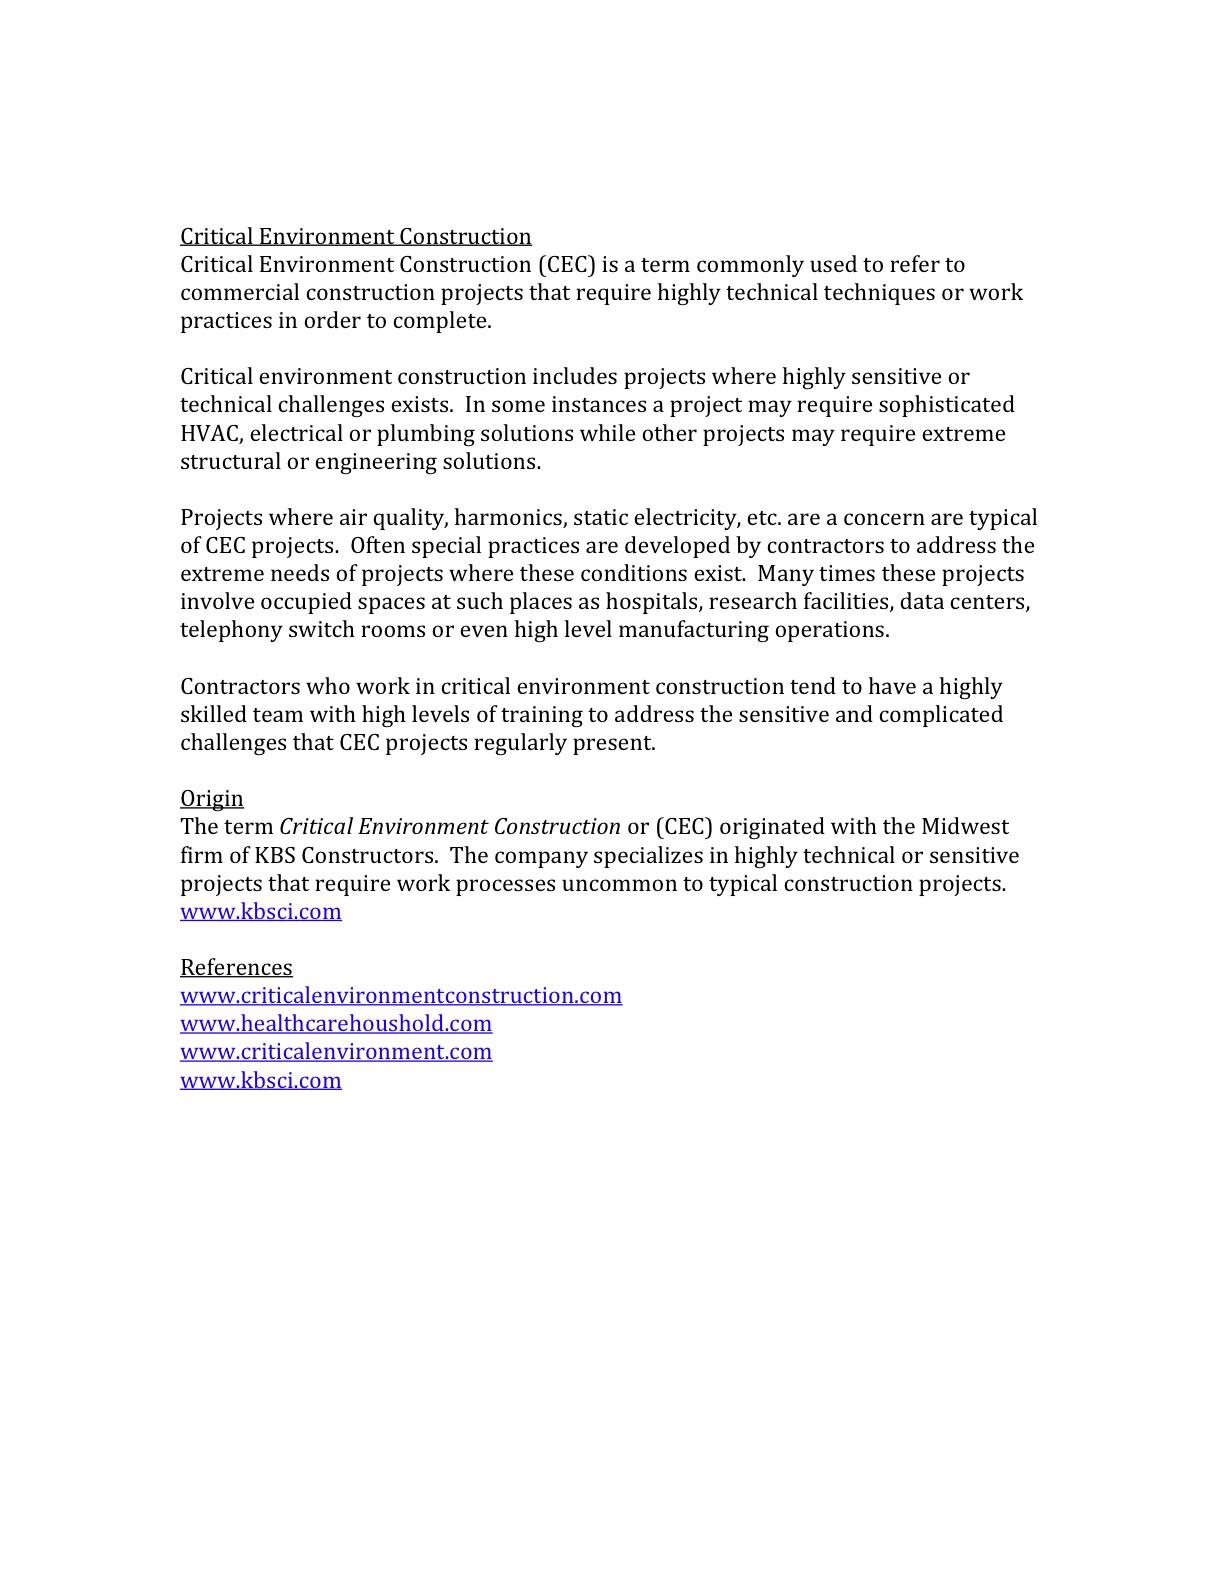 file:critical environment construction definition - wikimedia